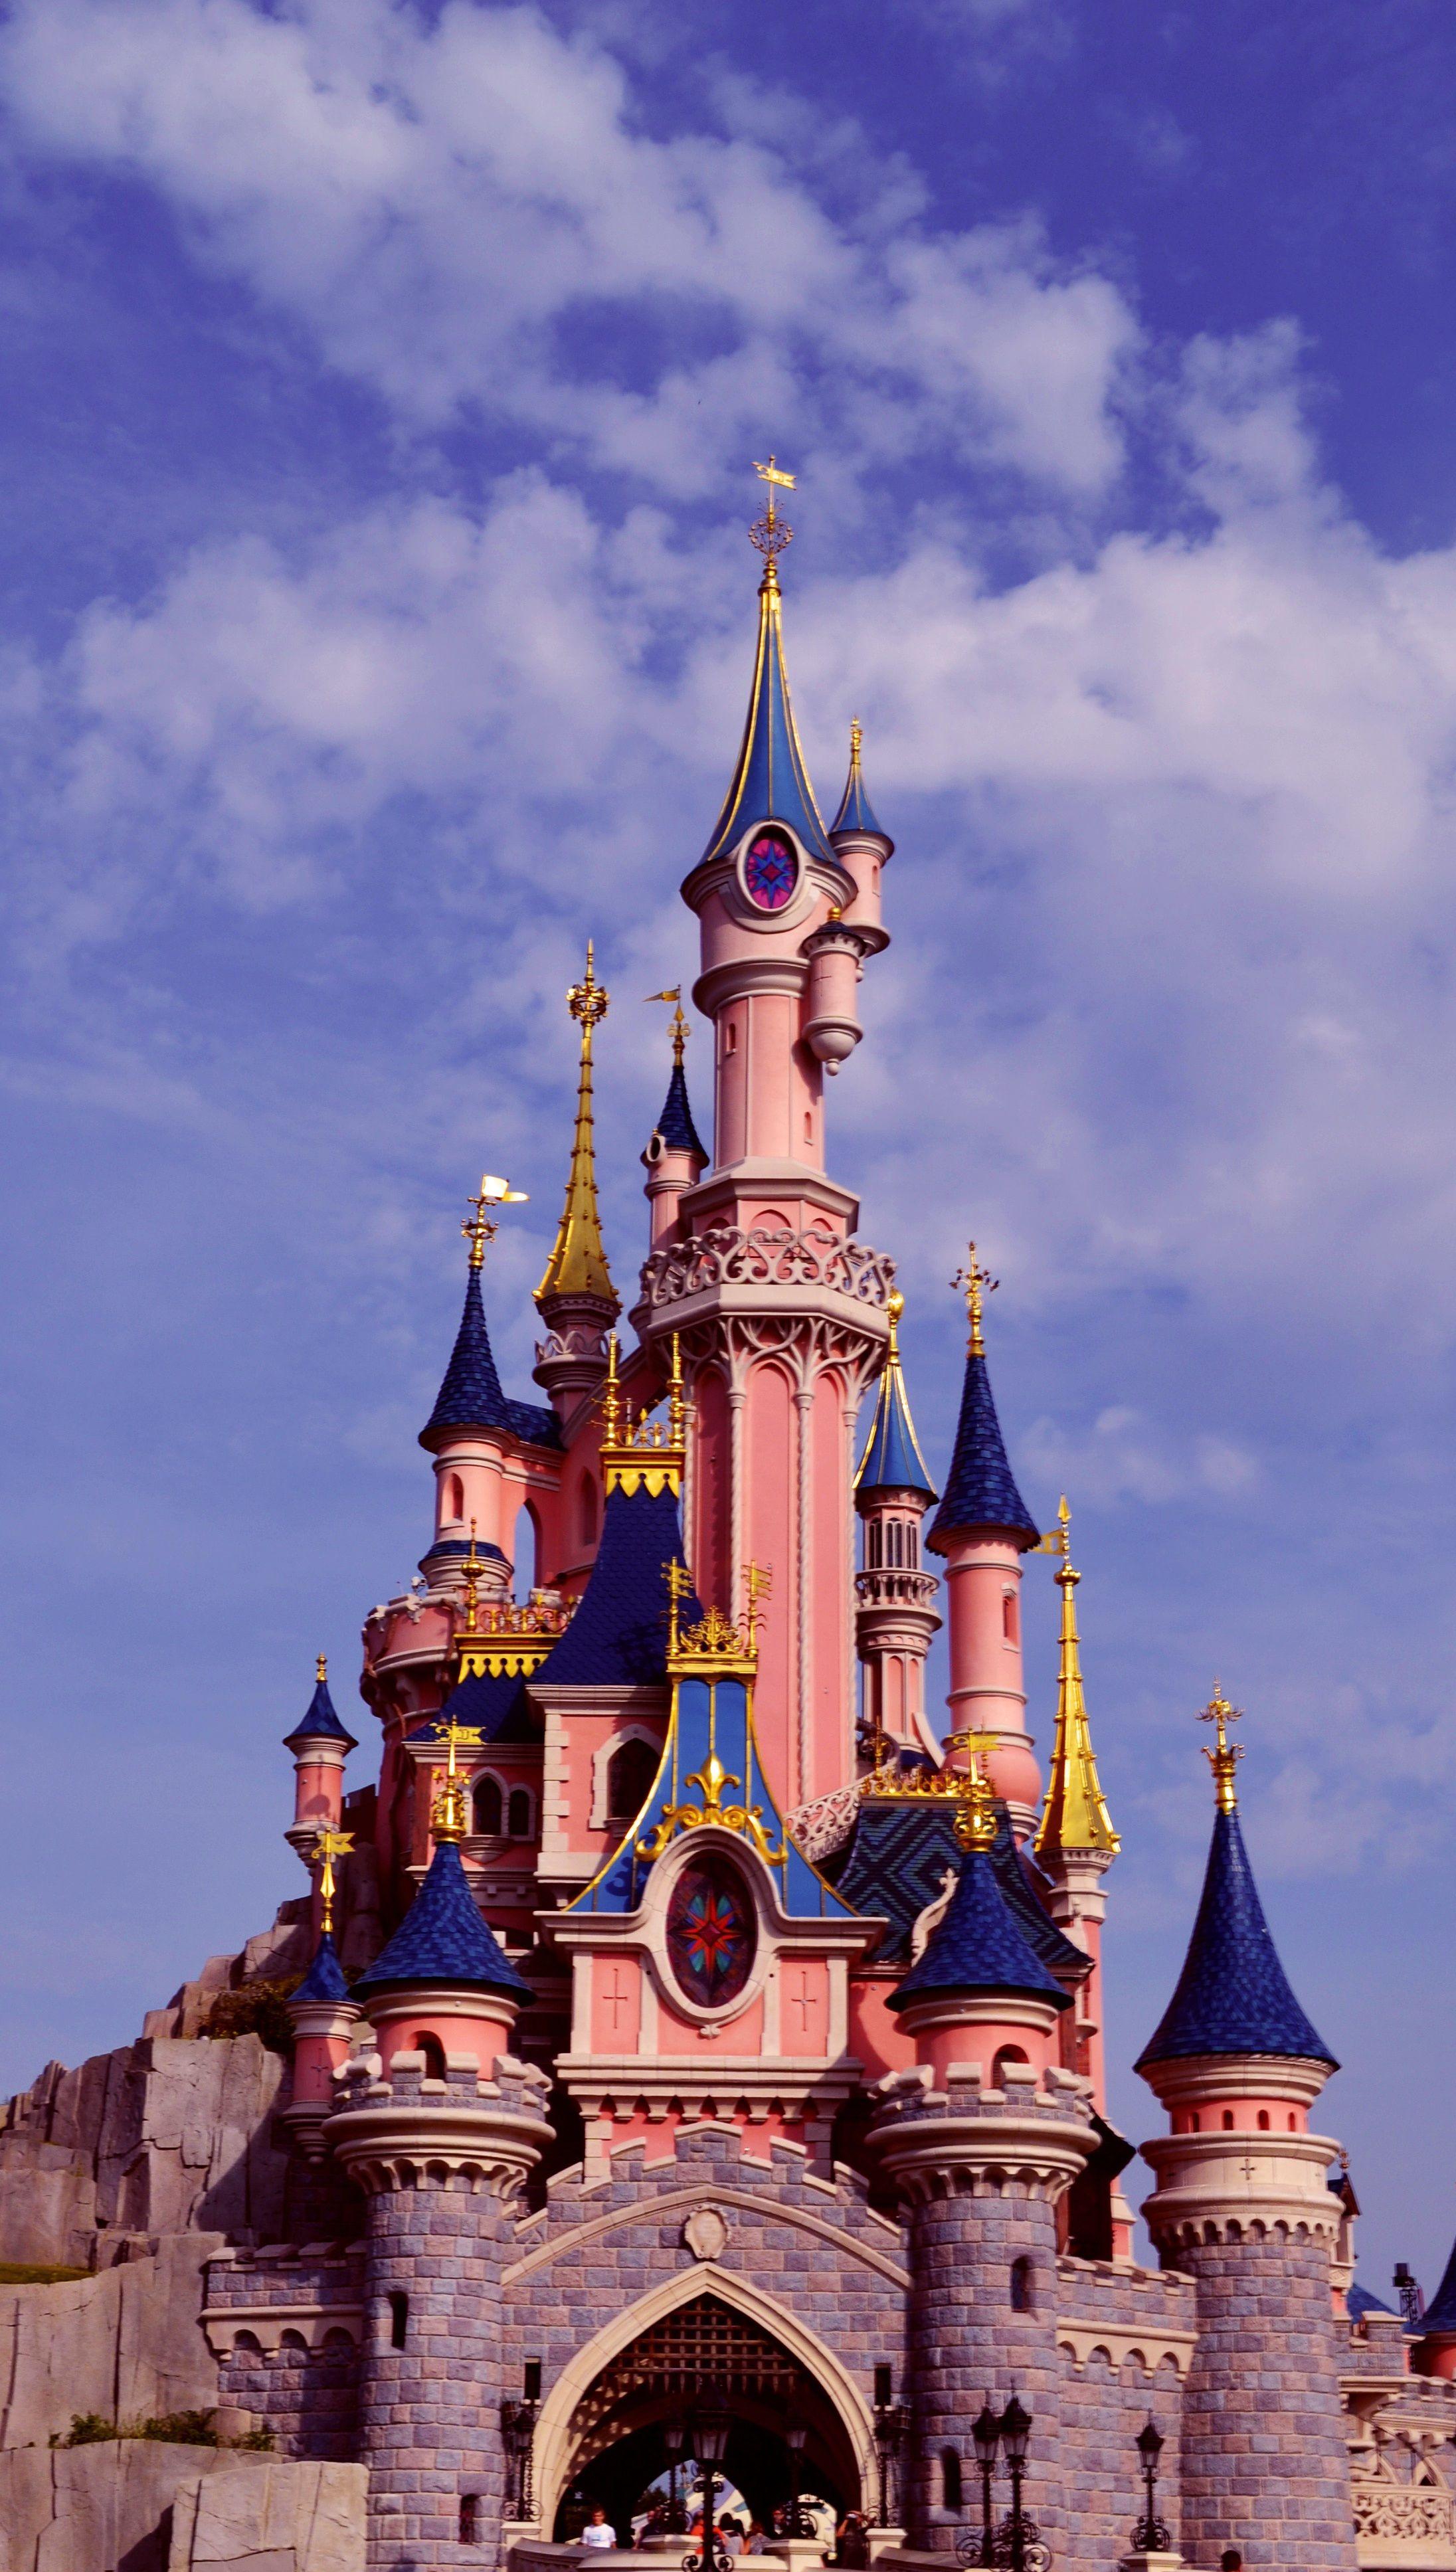 Disneyland In Paris Pretty Wallpapers Tumblr Cute Disneyland Park Sleeping Beauty S Castle 880126 Hd Wallpaper Backgrounds Download